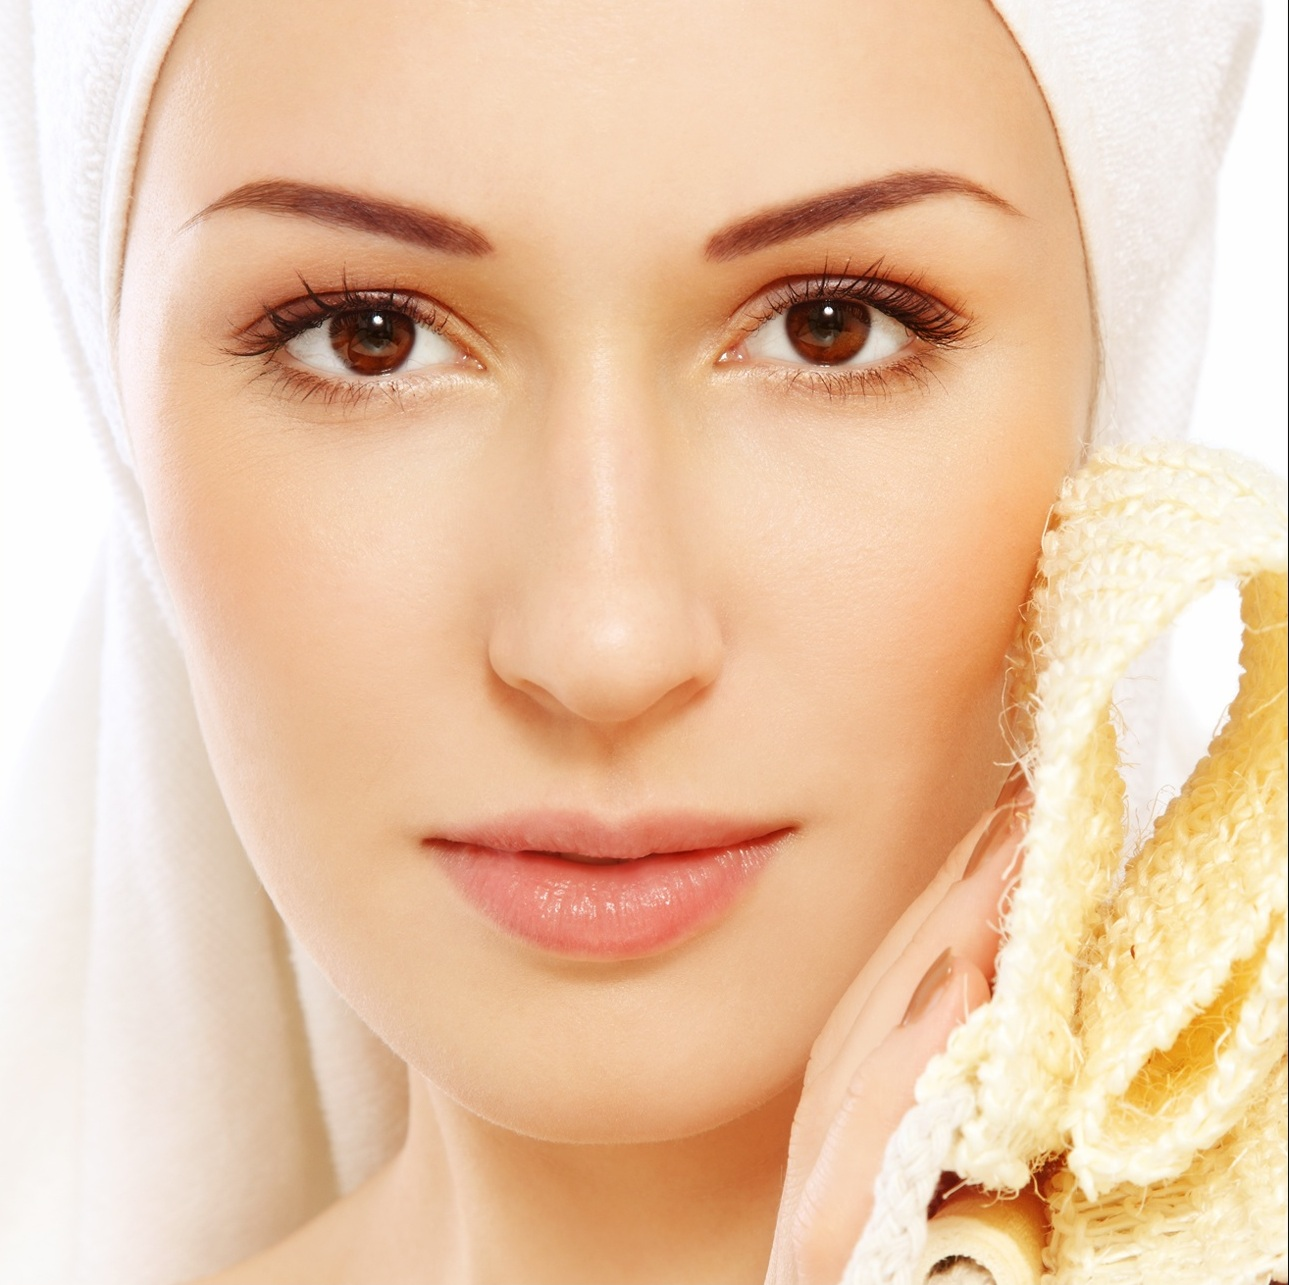 девушка в полотенце на голове